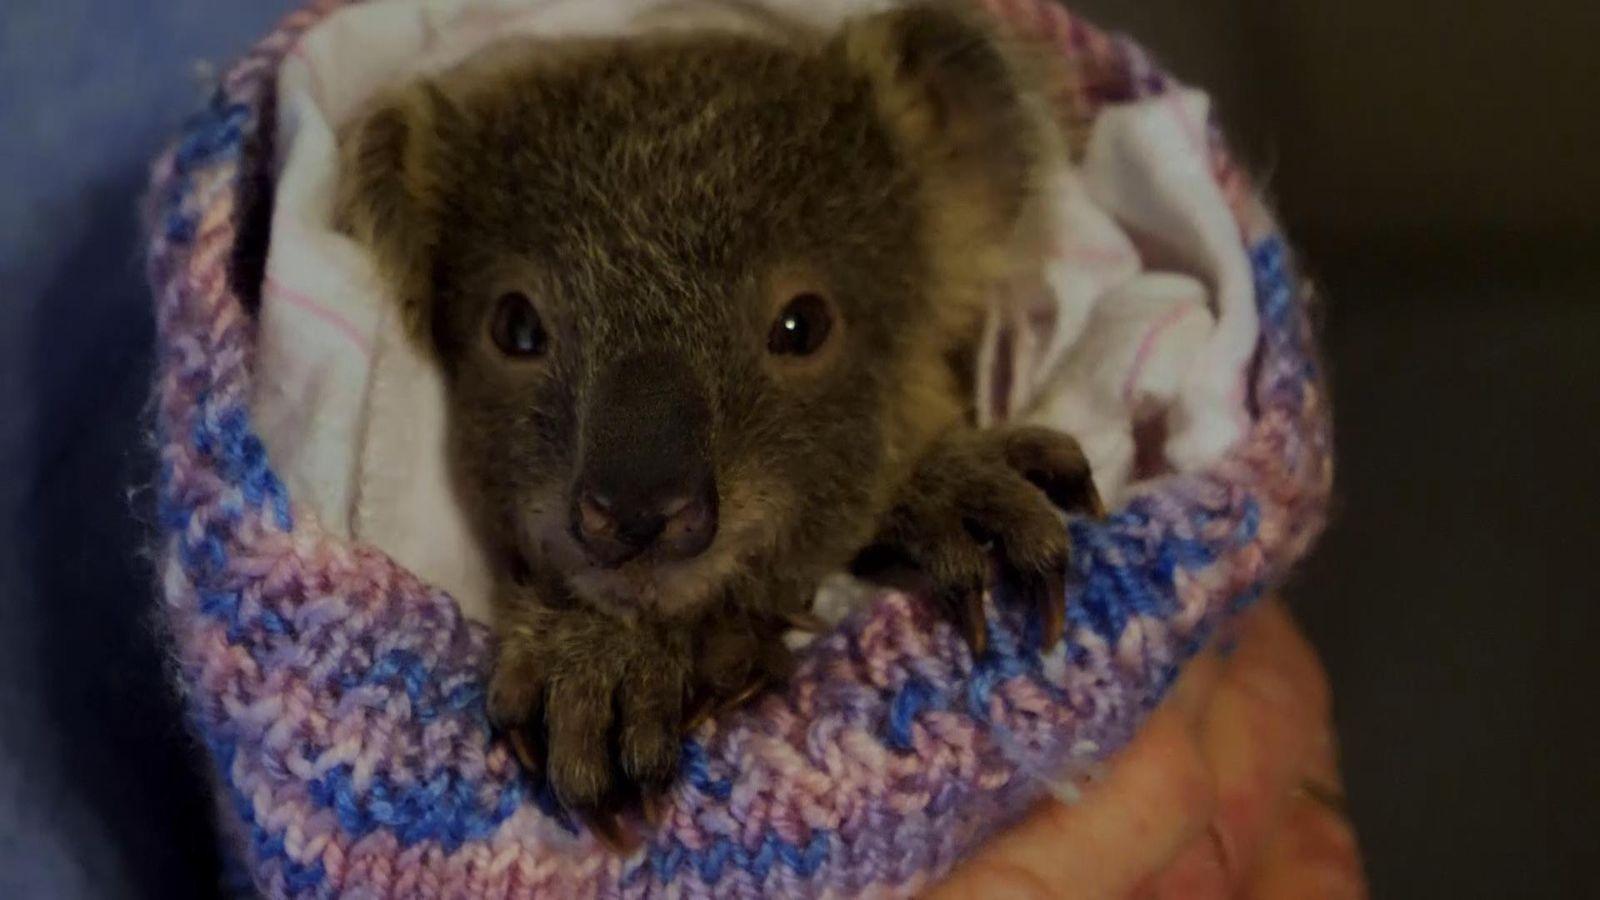 australia bushfires  meet the koalas lucky to be alive after devastating blazes